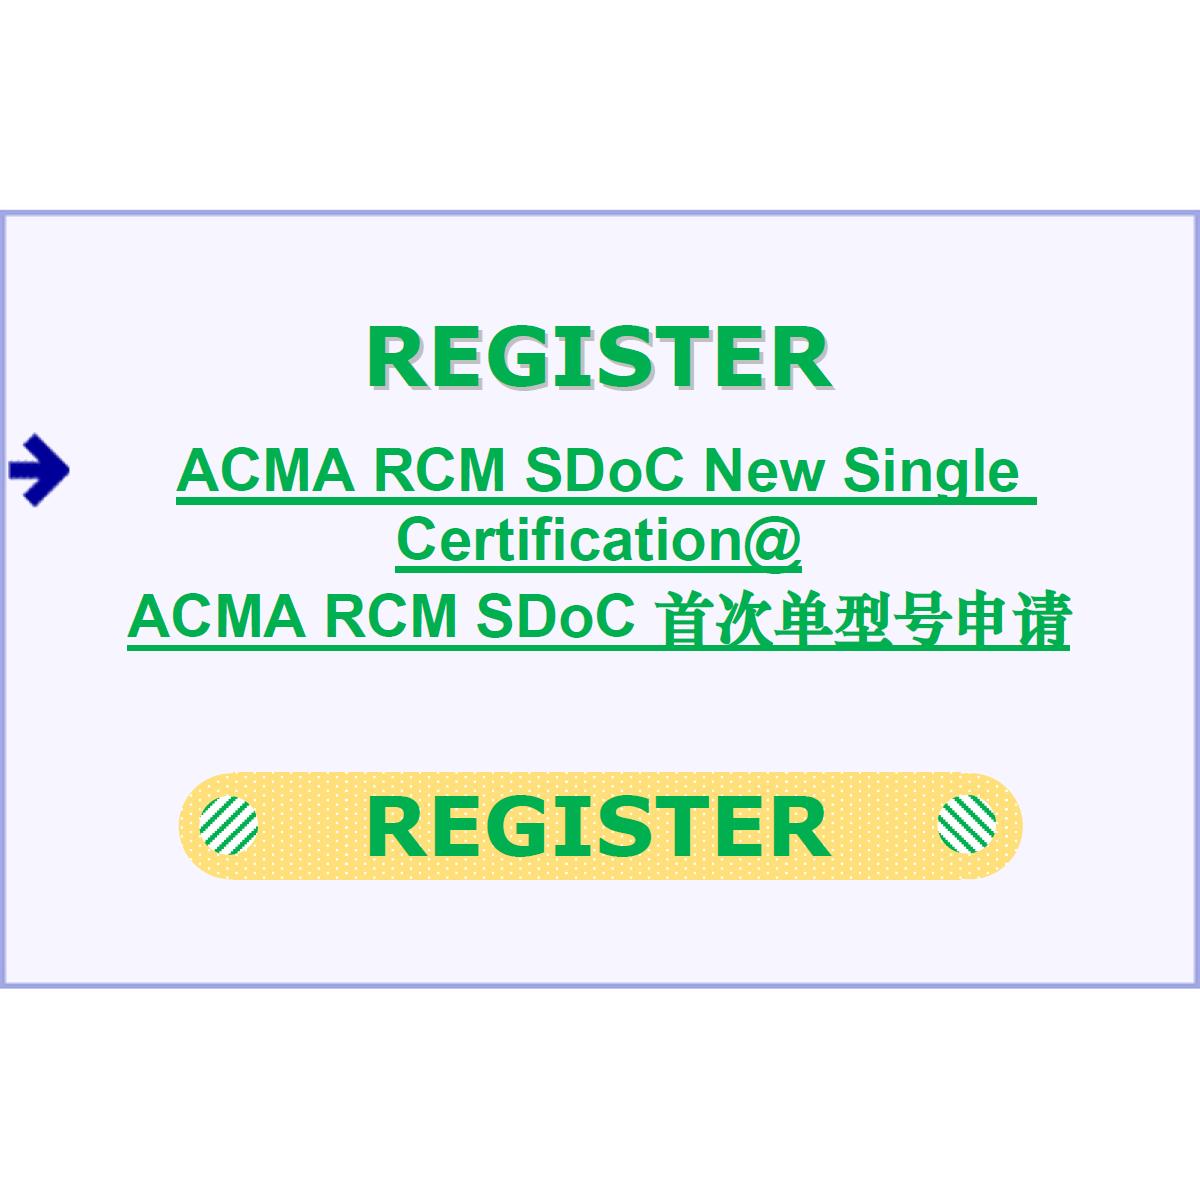 RCM Device Type_Customer Access Equipment -> Gateway Device@网关产品